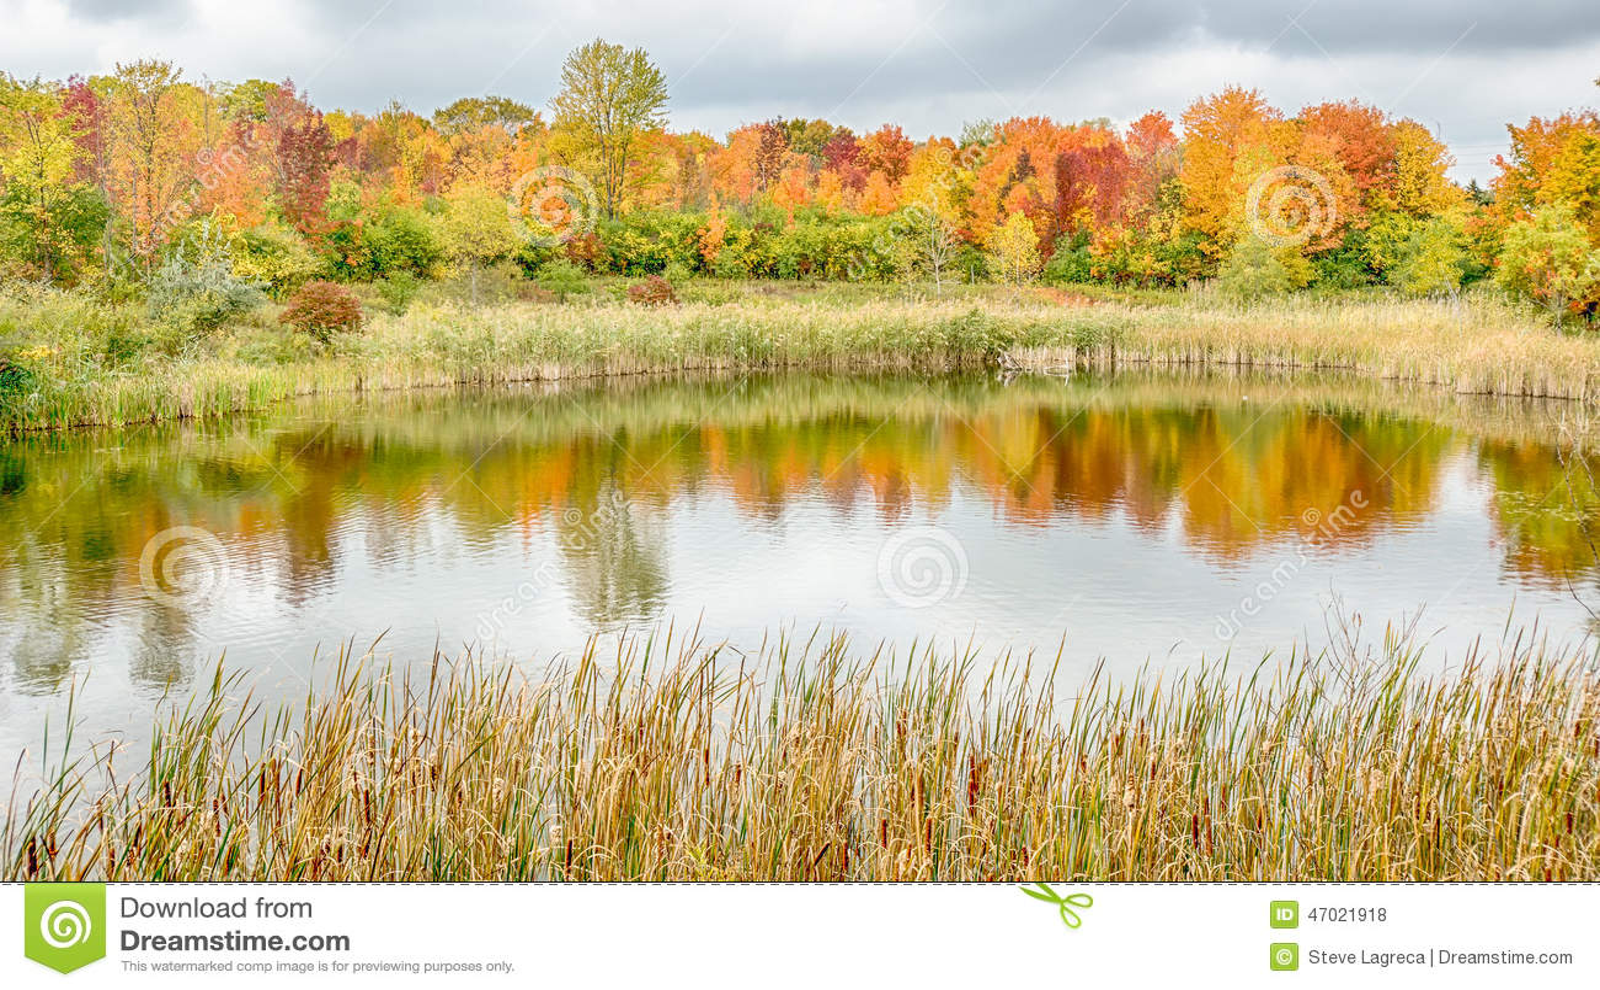 Woodland hills nature park